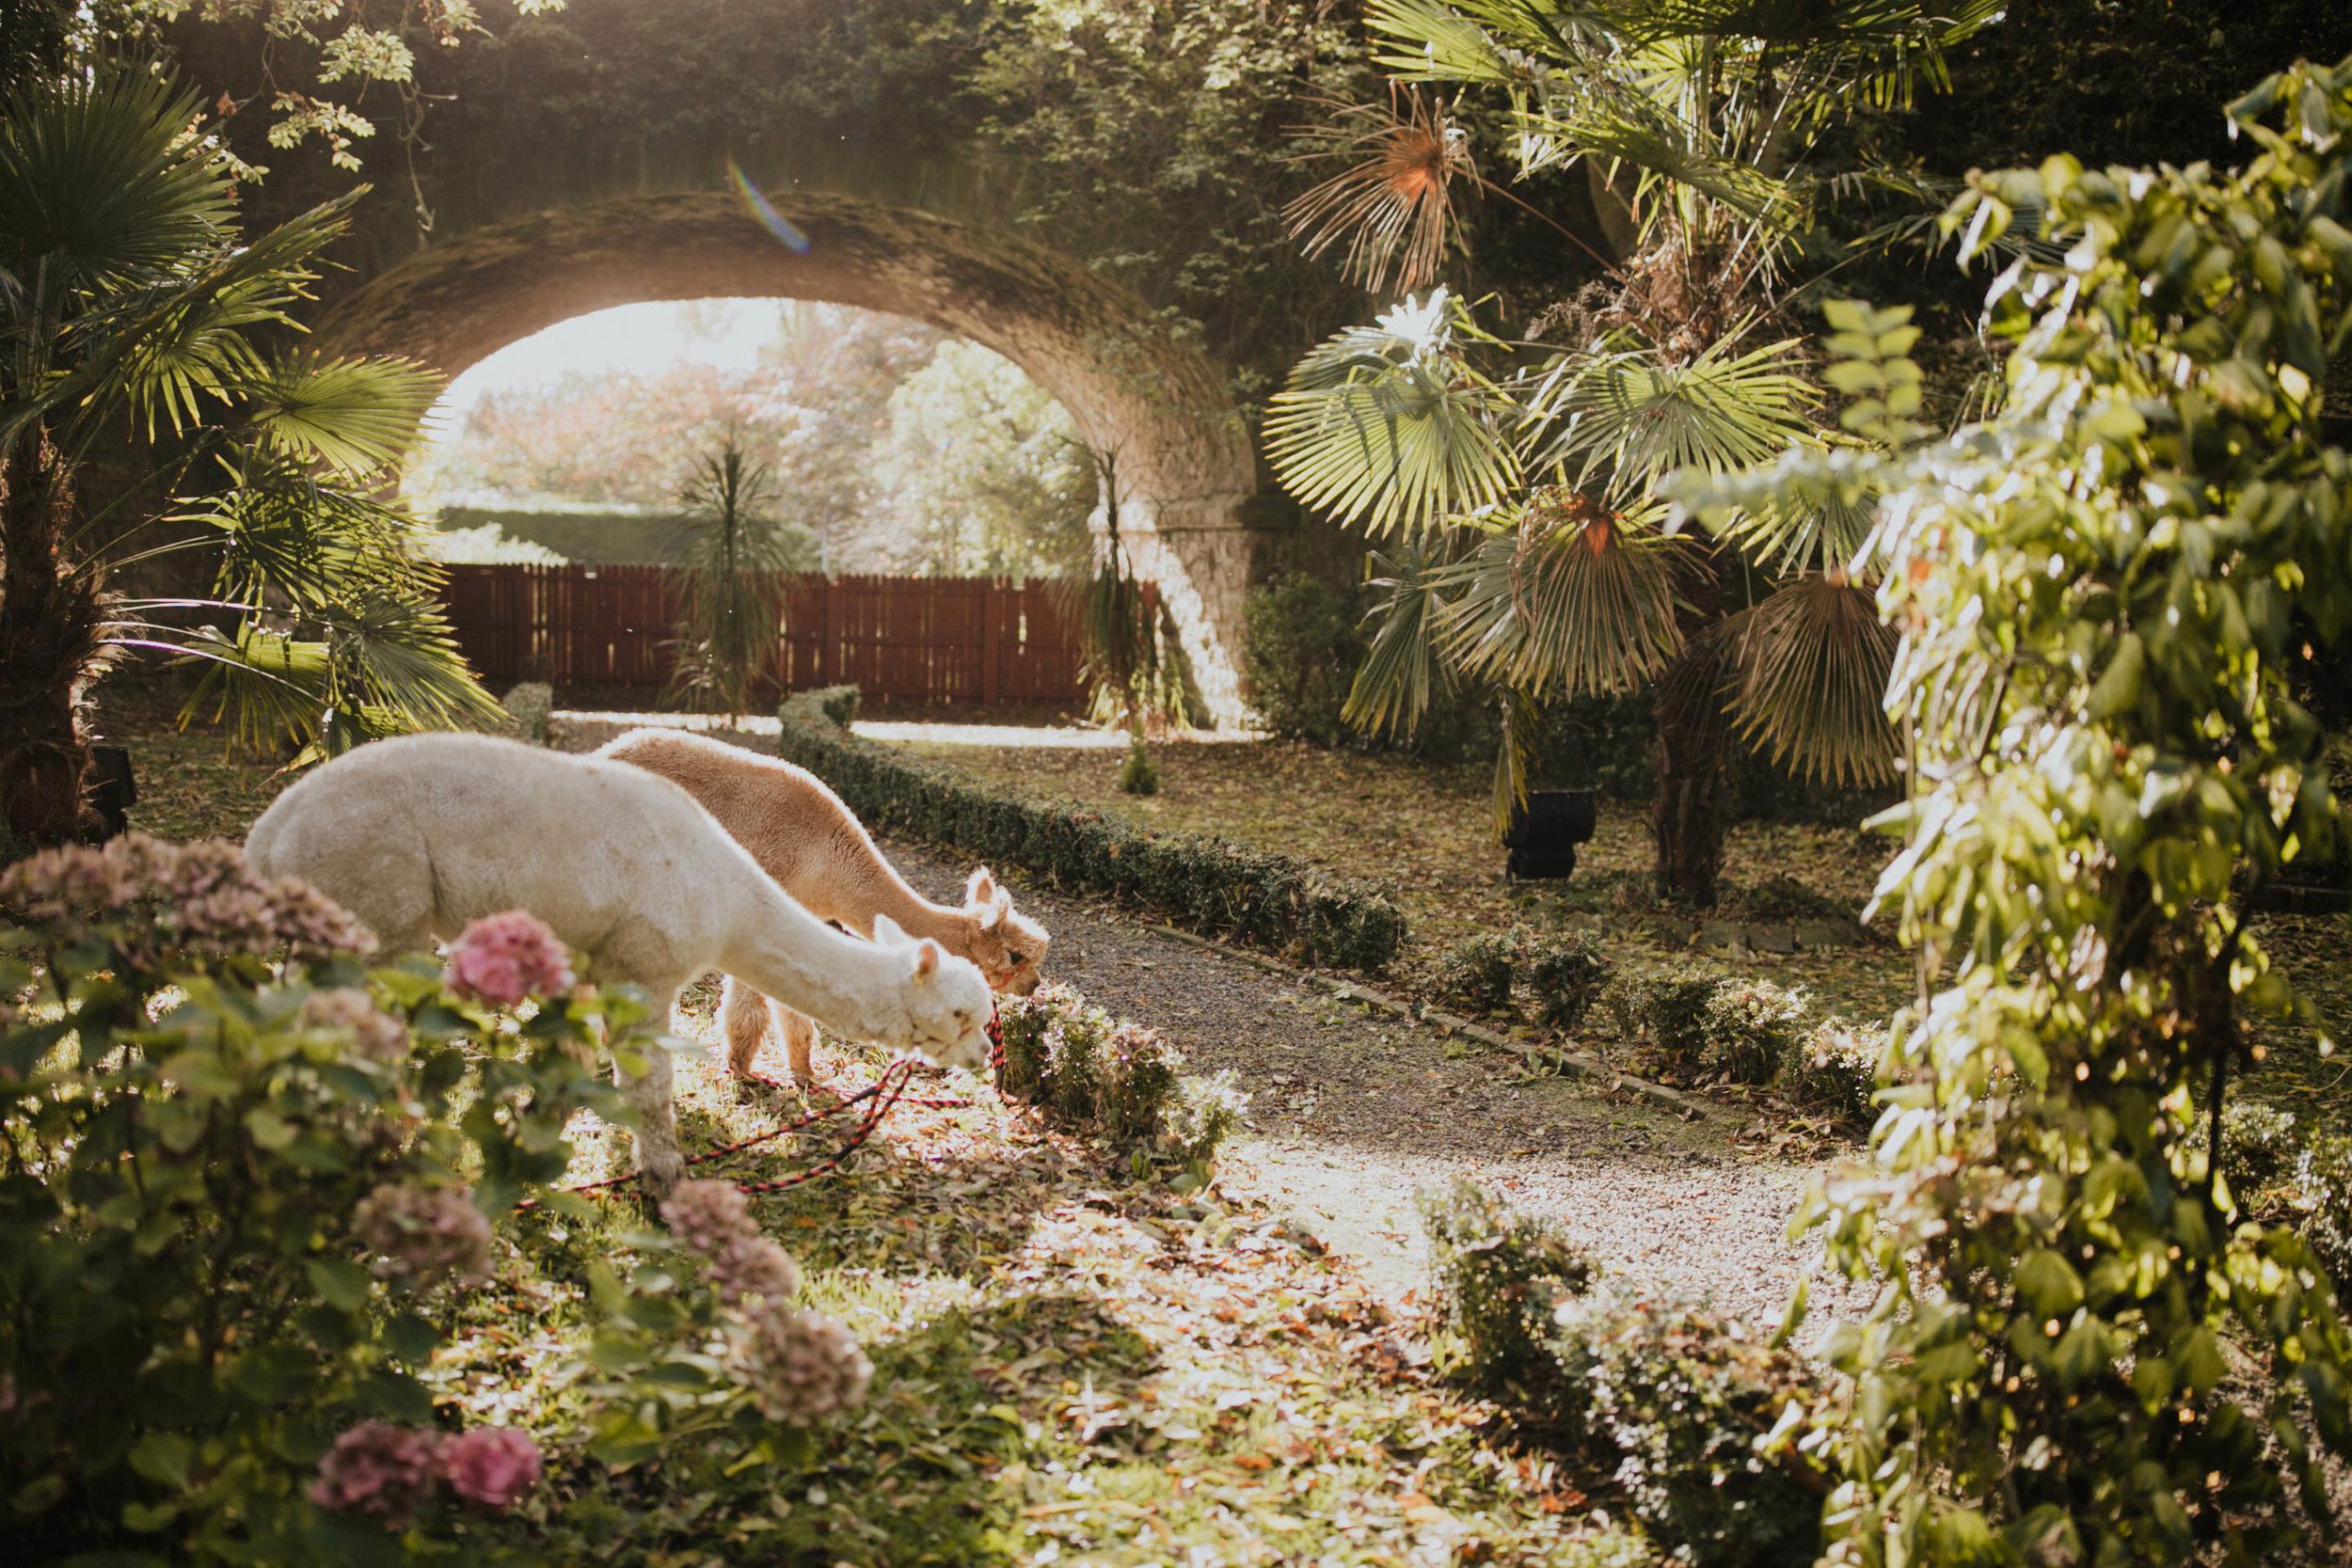 boho_wedding_alpaca_xpose_station_house_livia_figueiredo_photography_07.jpg